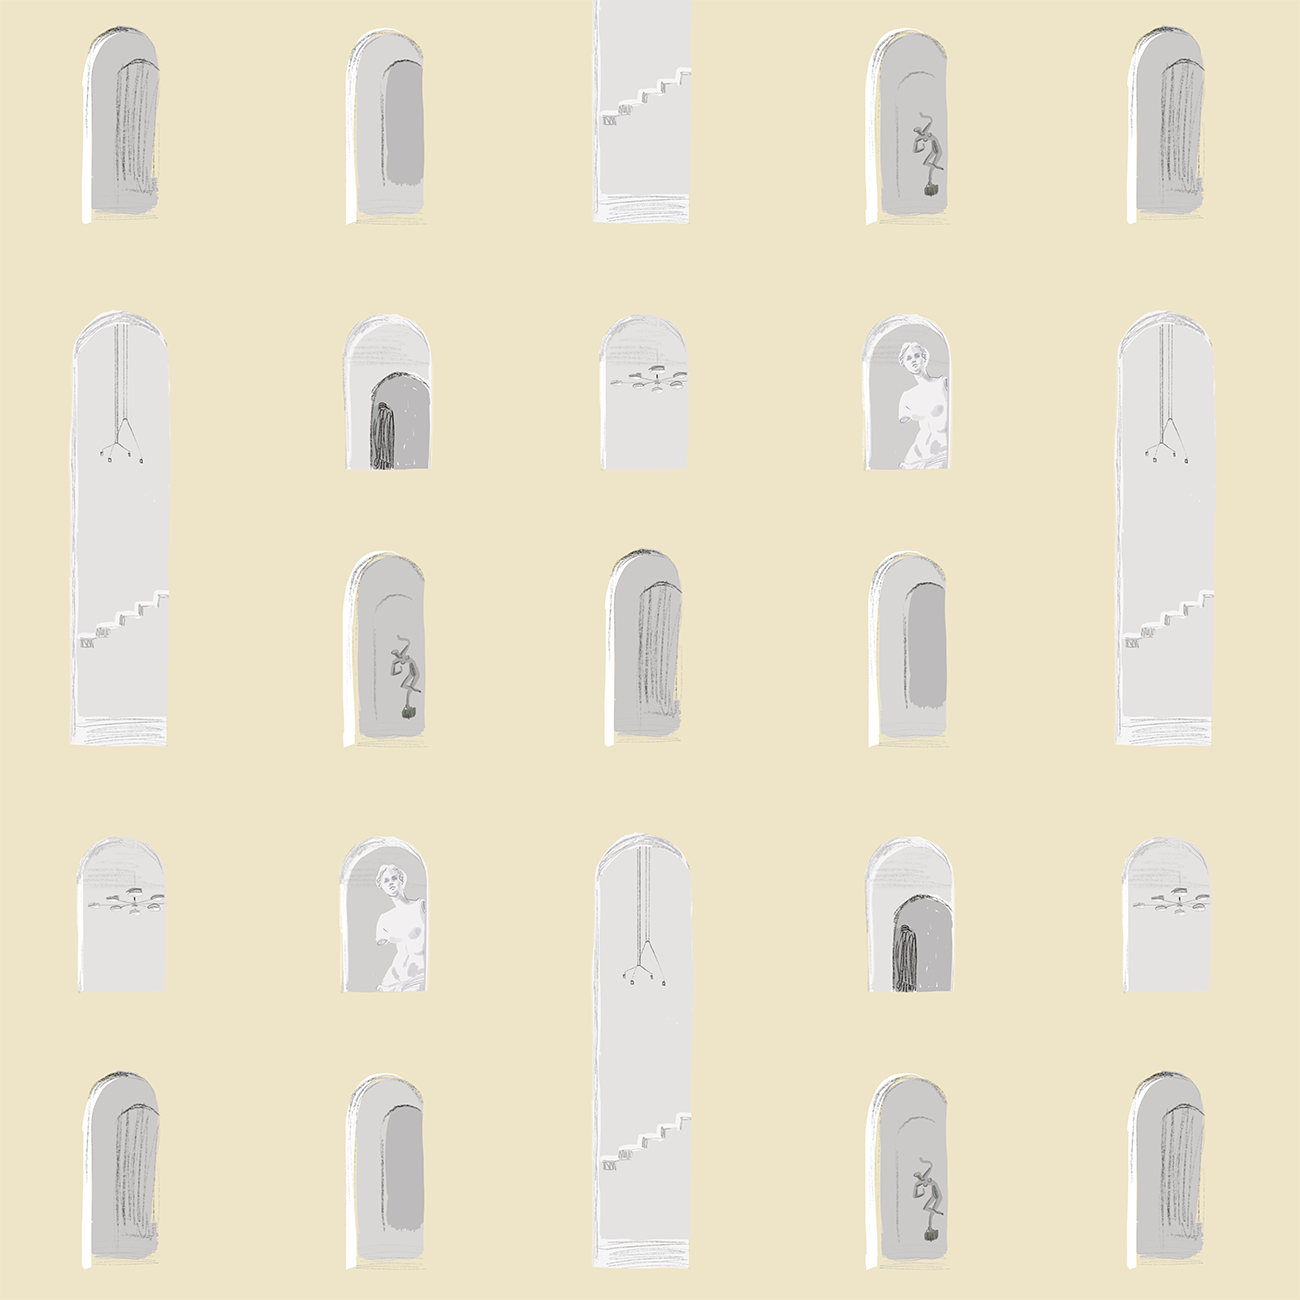 Pattern Design by Silvana Mariani